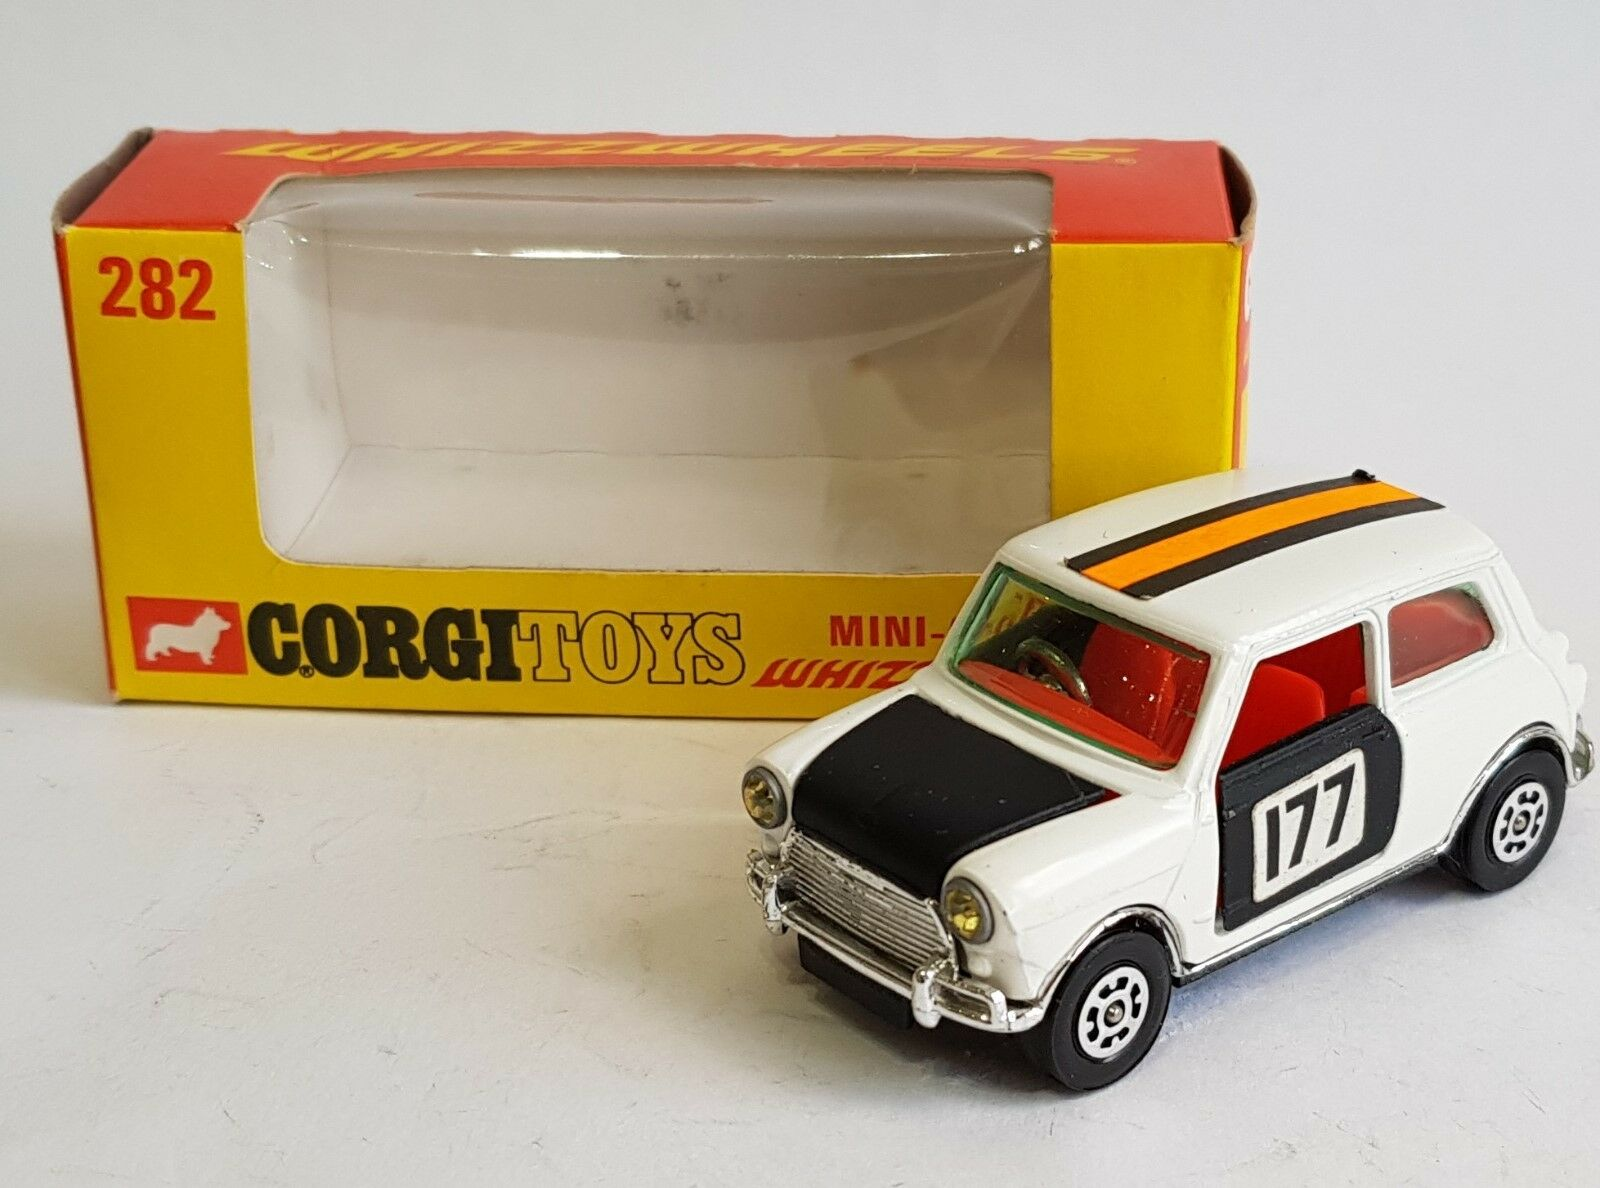 Very Rare bluee Screen, Corgi Toys 282, Mini-Cooper 'Whizzwheels', - Superb Mint.